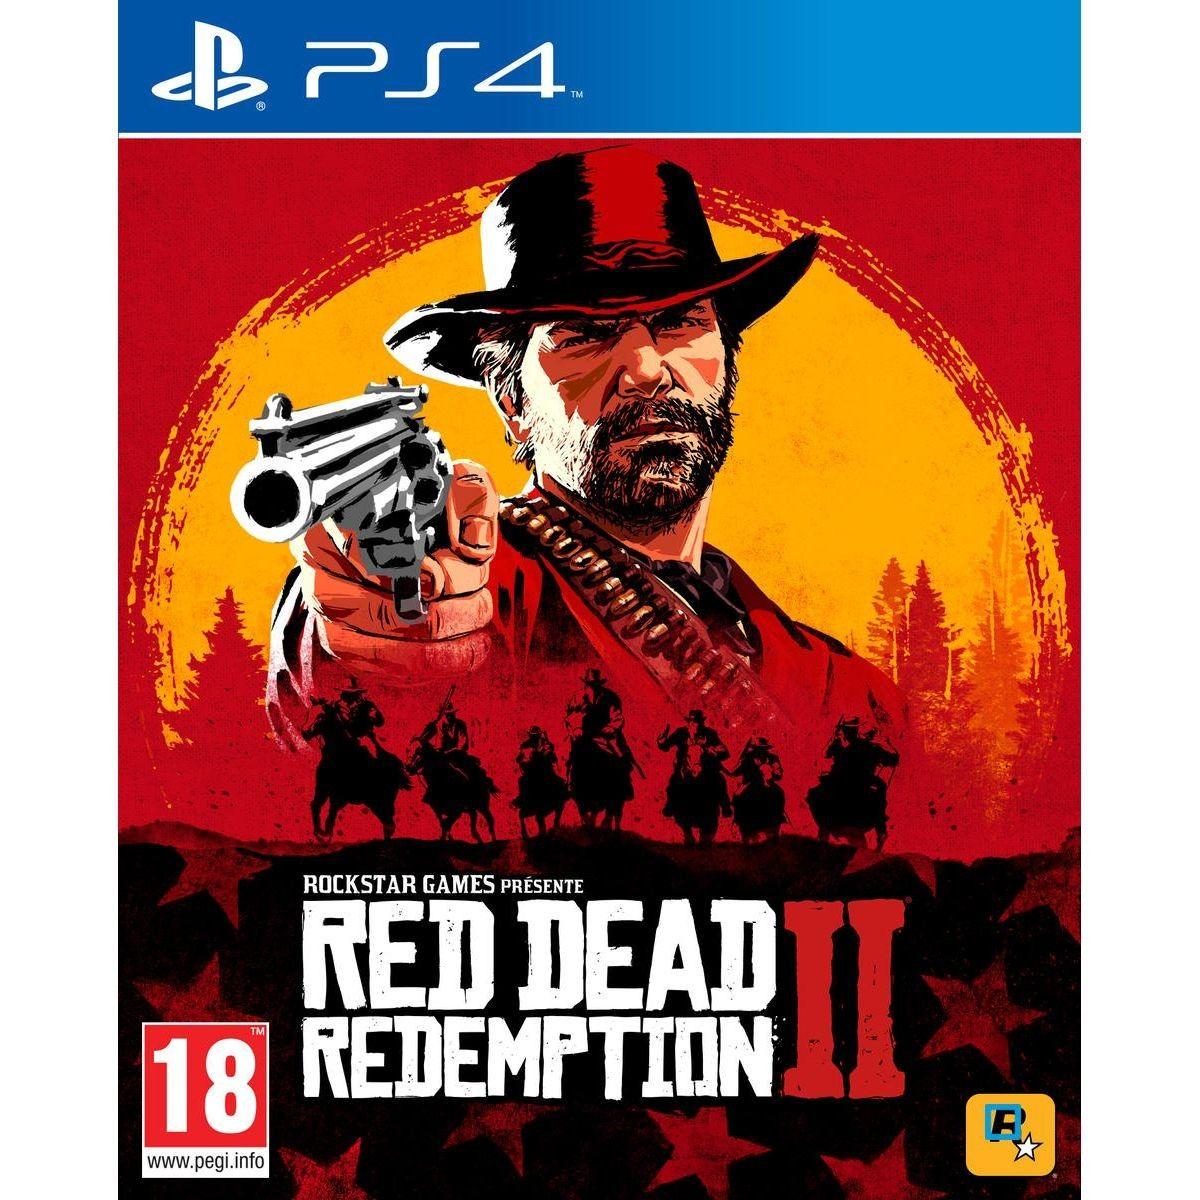 Red Dead Redemption 2 Ps4 Products Ps4 Jeux Ps4 Et Red Dead Redemption